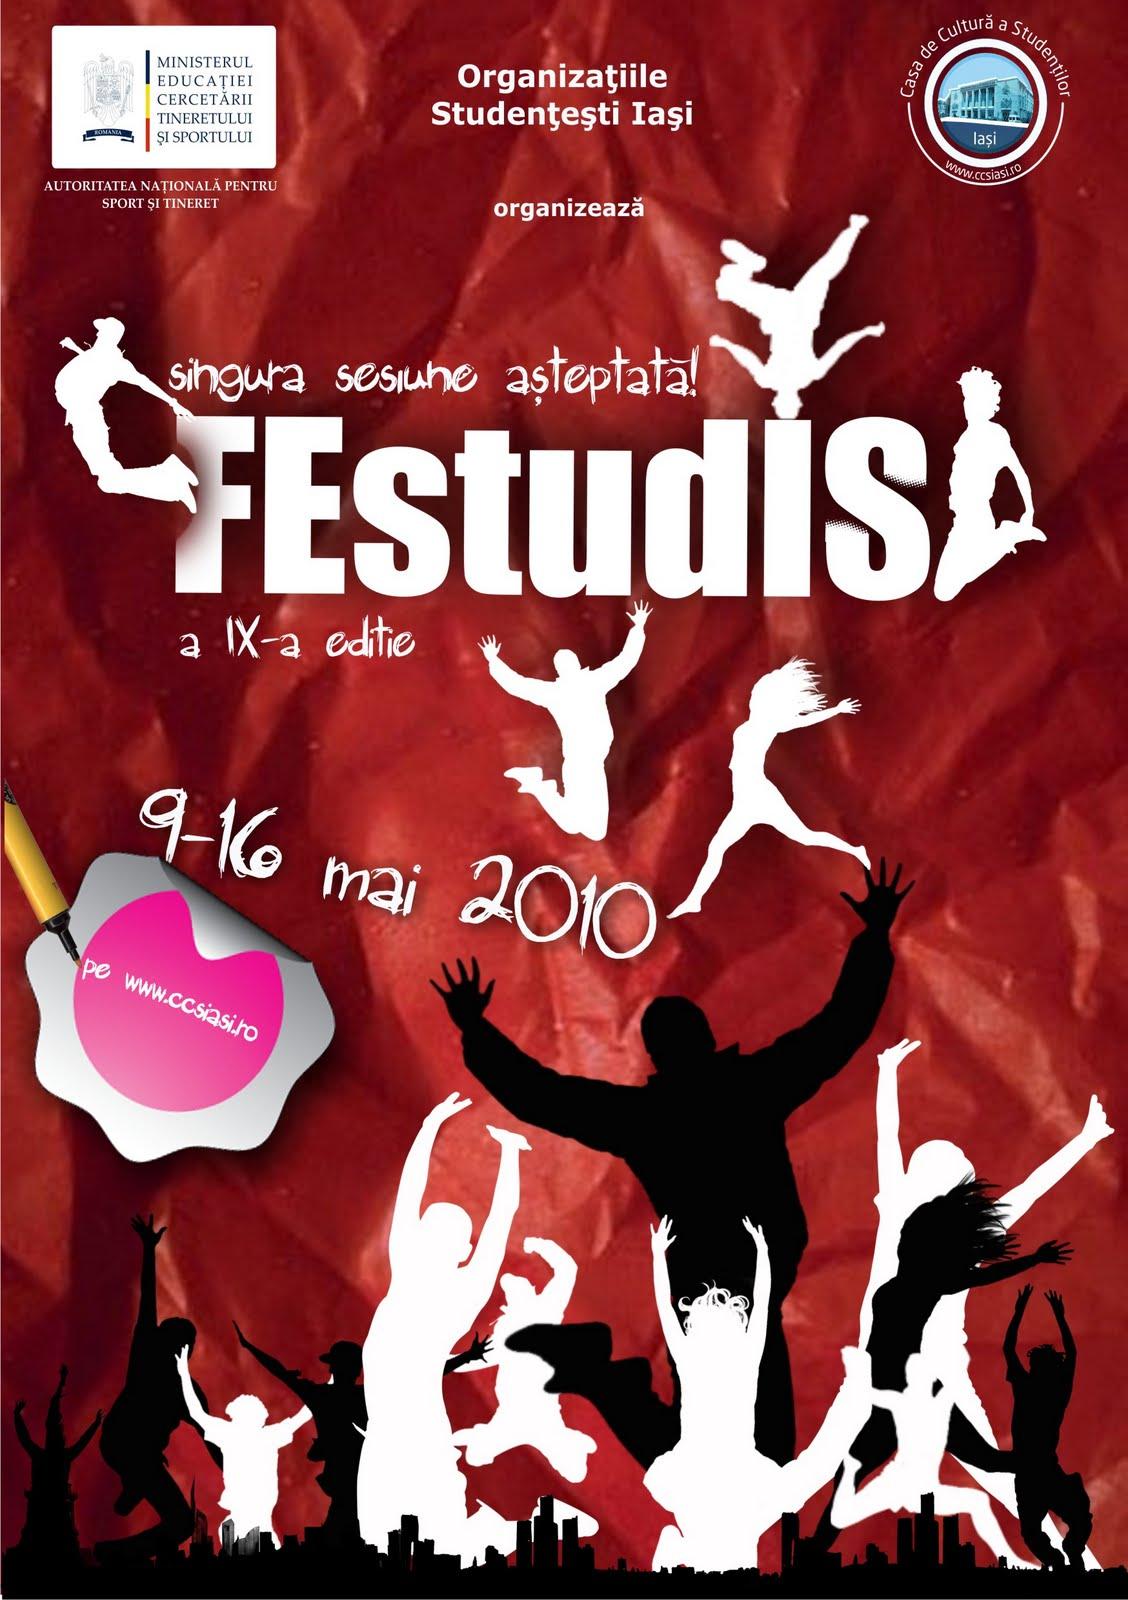 Festudis a IX-a editie 10 -16 mai 2010 Macheta+A5+festudis